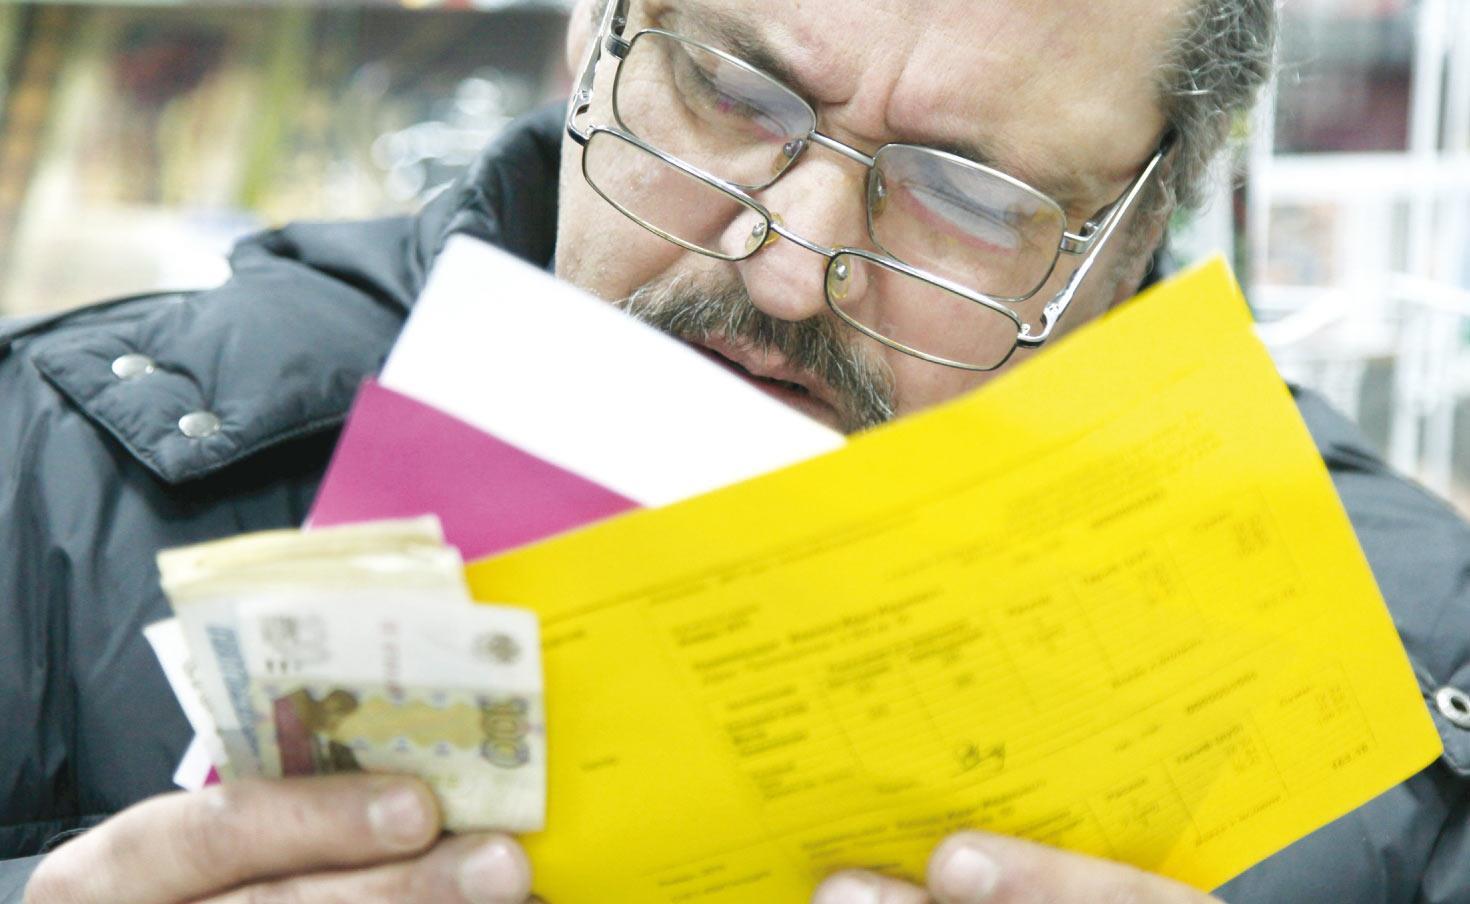 ВБрянске повысят тарифы ЖКХ